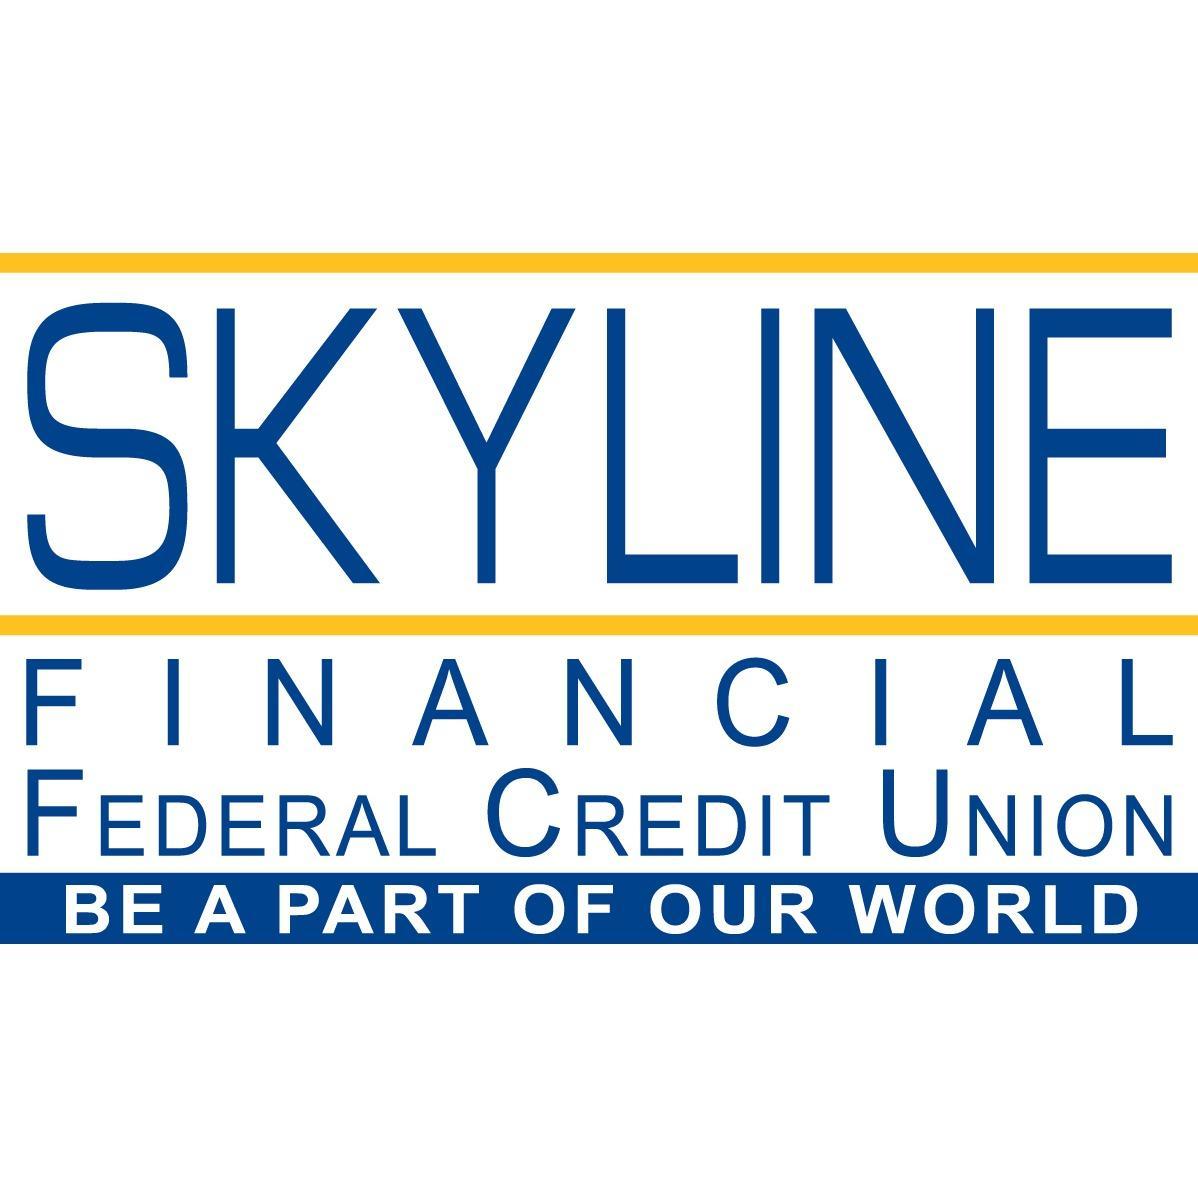 Skyline Financial Federal Credit Union image 2